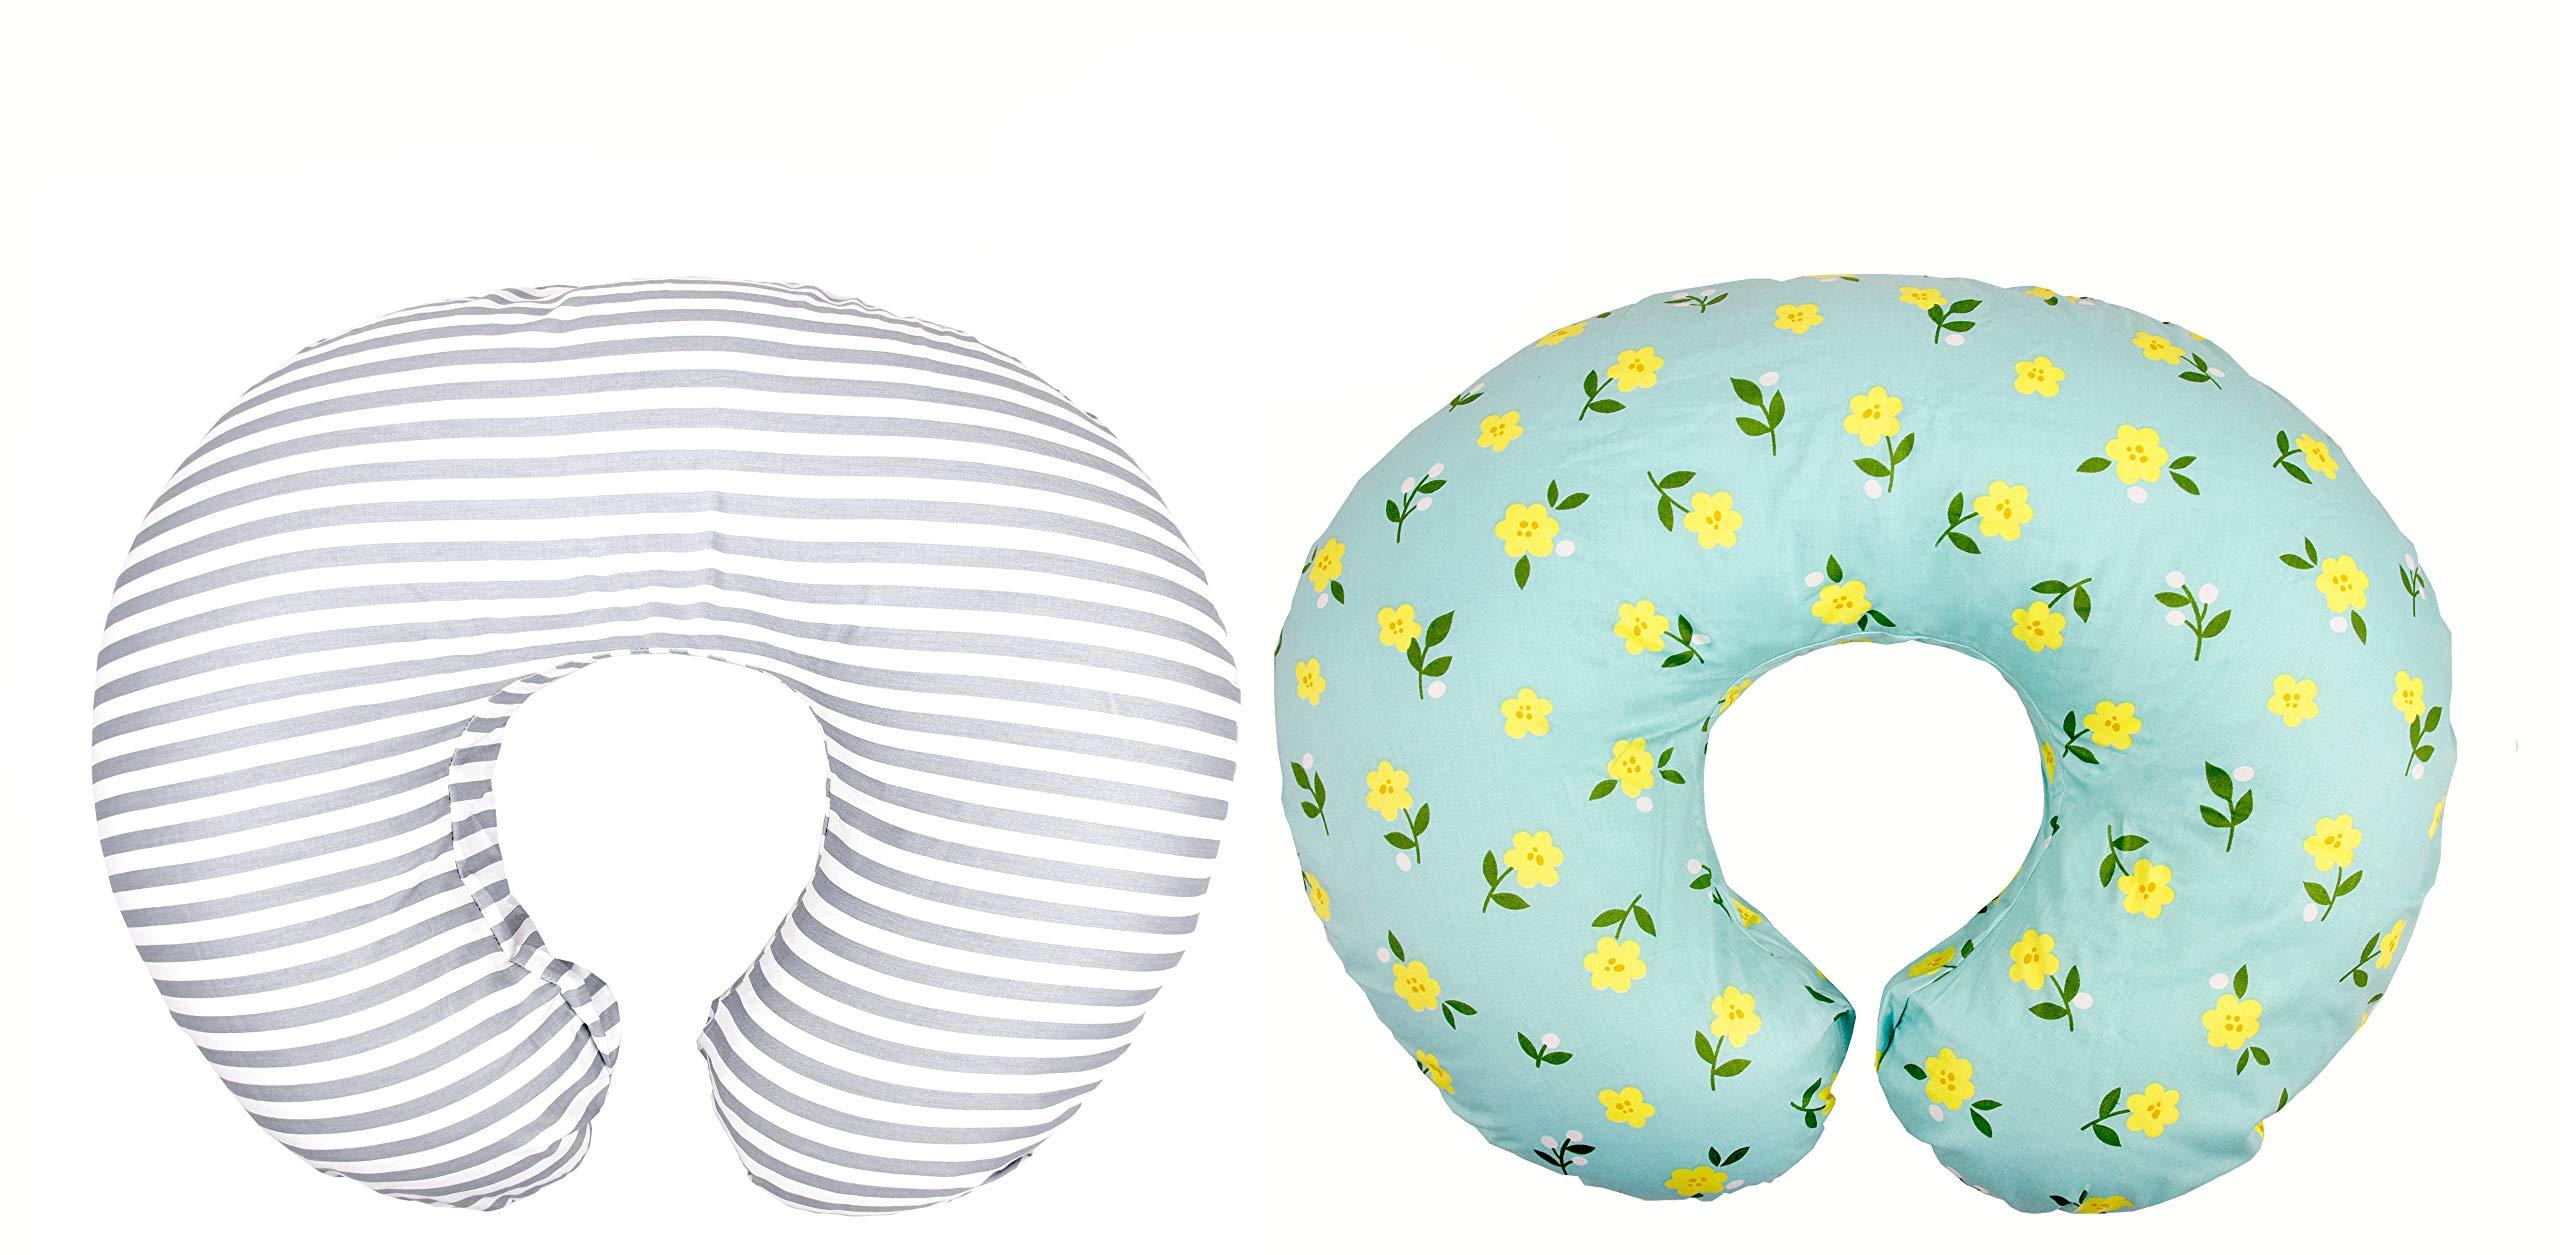 Premium Quality 2 Pack Nursing Pillow Covers by Mila Millie | Baby Girl Chic Flower Design | Gray Stripes Unisex Slipcover | 100% Cotton Hypoallergenic | Breastfeeding | Shower Gift | Fits Boppy